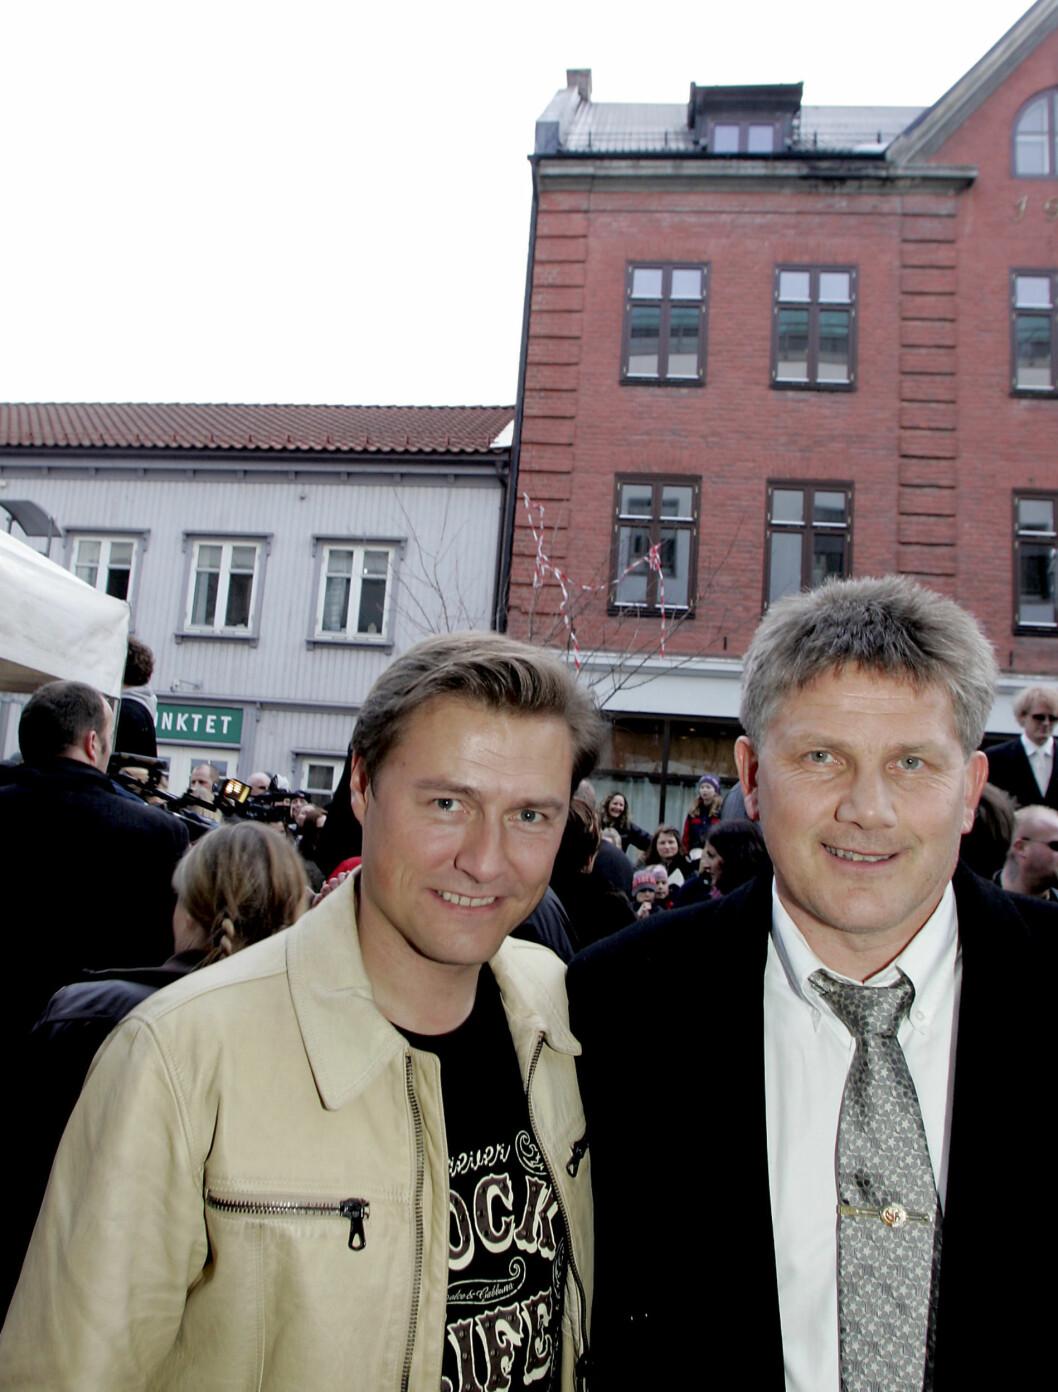 <strong>PÅ RØD LØPER:</strong> Idar Vollvik og Knut Torbjørn Eggen kommer til premieren på filmen til Harald Zwart «Lange Flate ballær» i Fredrikstad.  Foto: SCANPIX